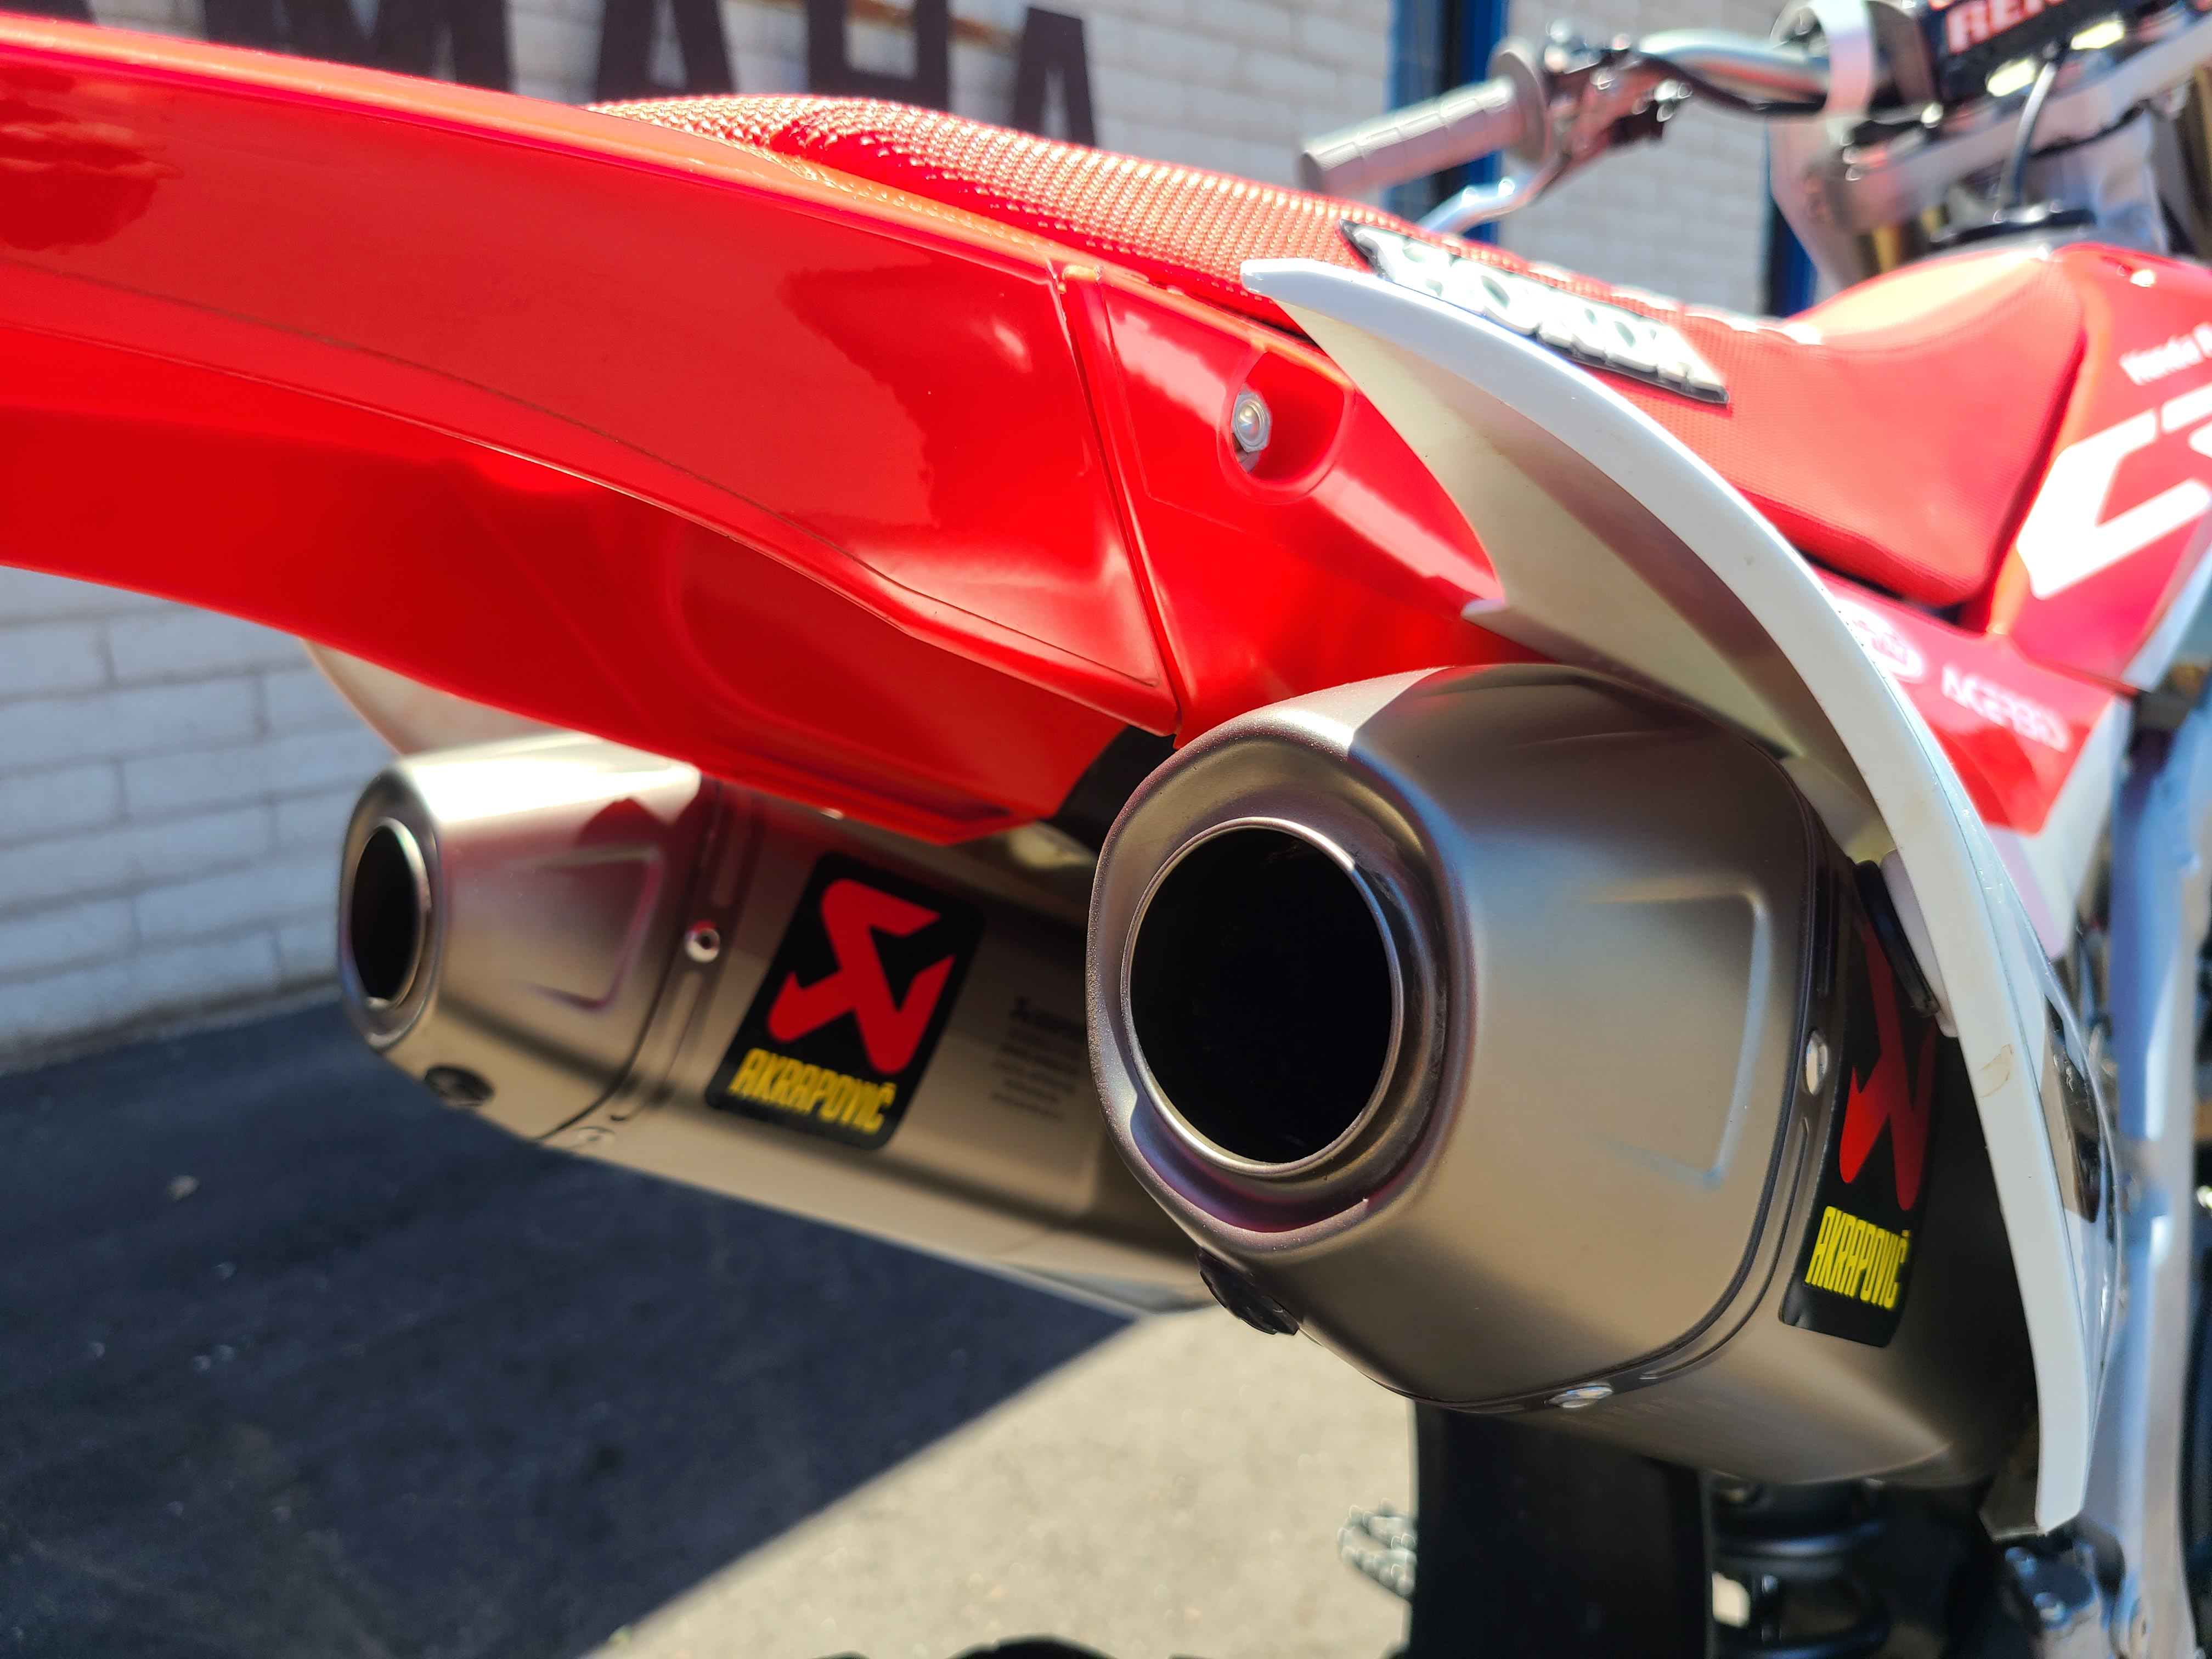 2018 Honda CRF 450R at Bobby J's Yamaha, Albuquerque, NM 87110